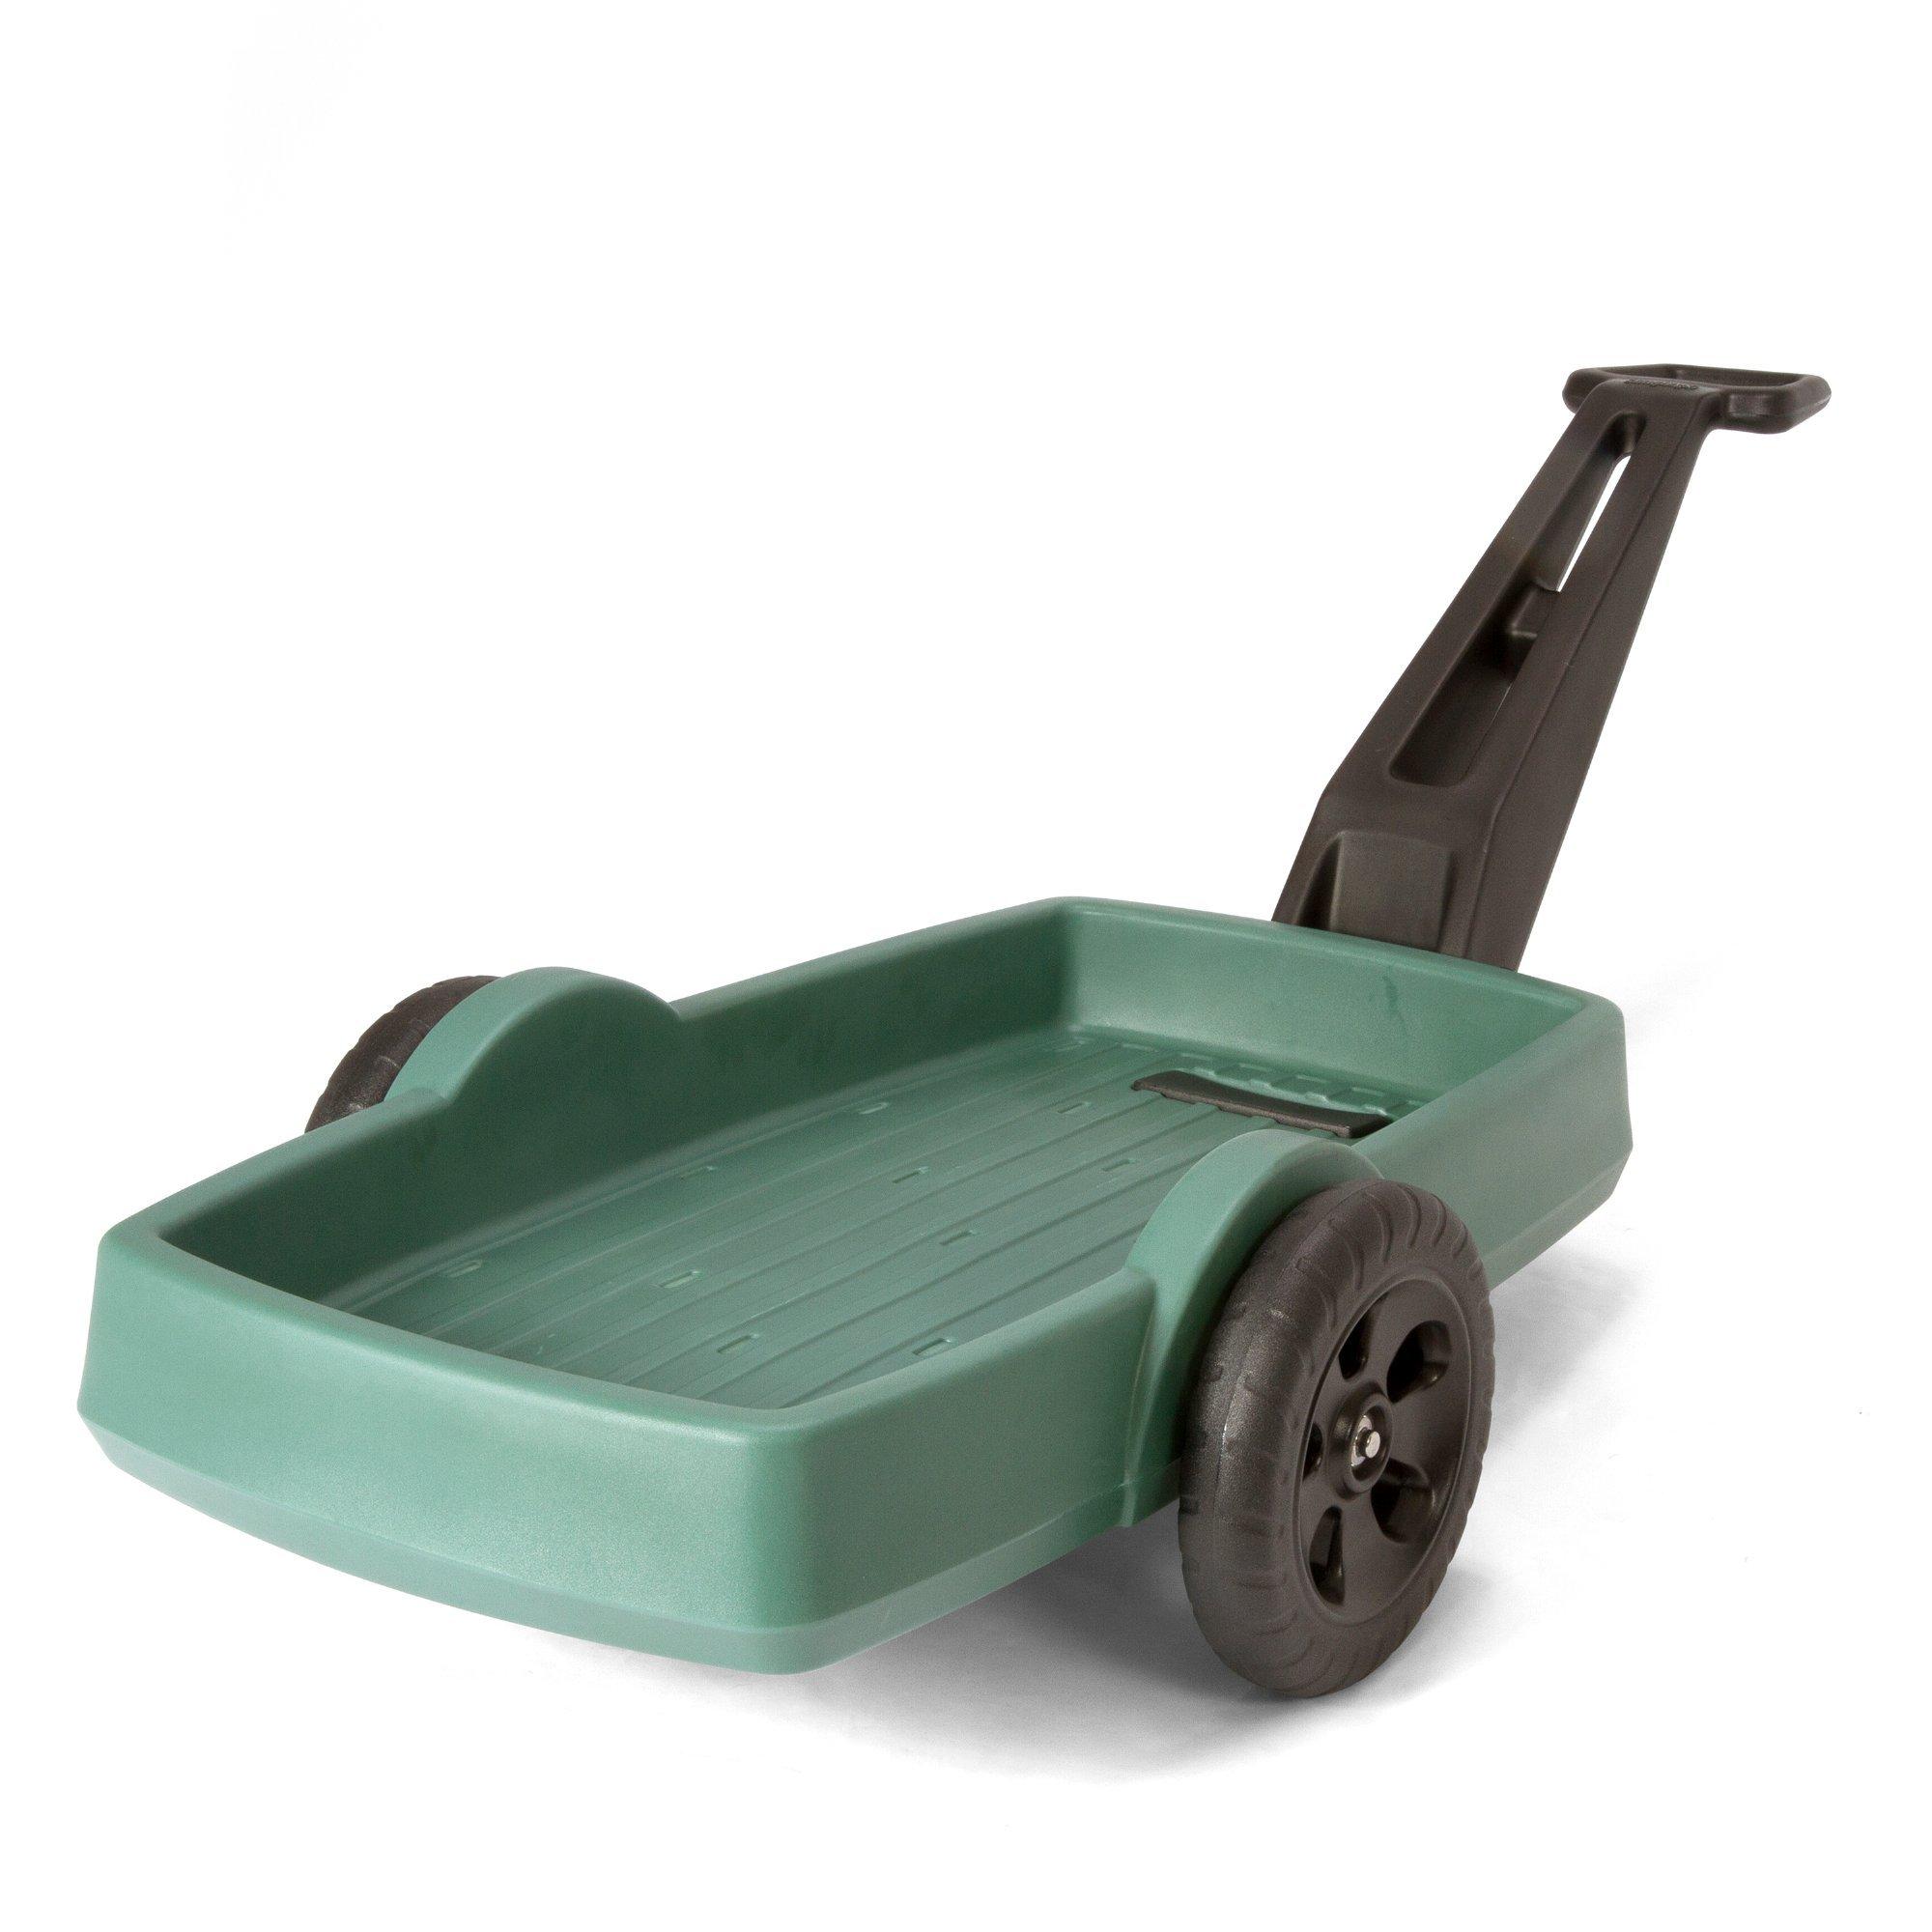 Simplay3 Easy Haul Plastic Flat Bed Yard and Garden Wagon, Heavy Duty 200 lbs. Capacity - Green